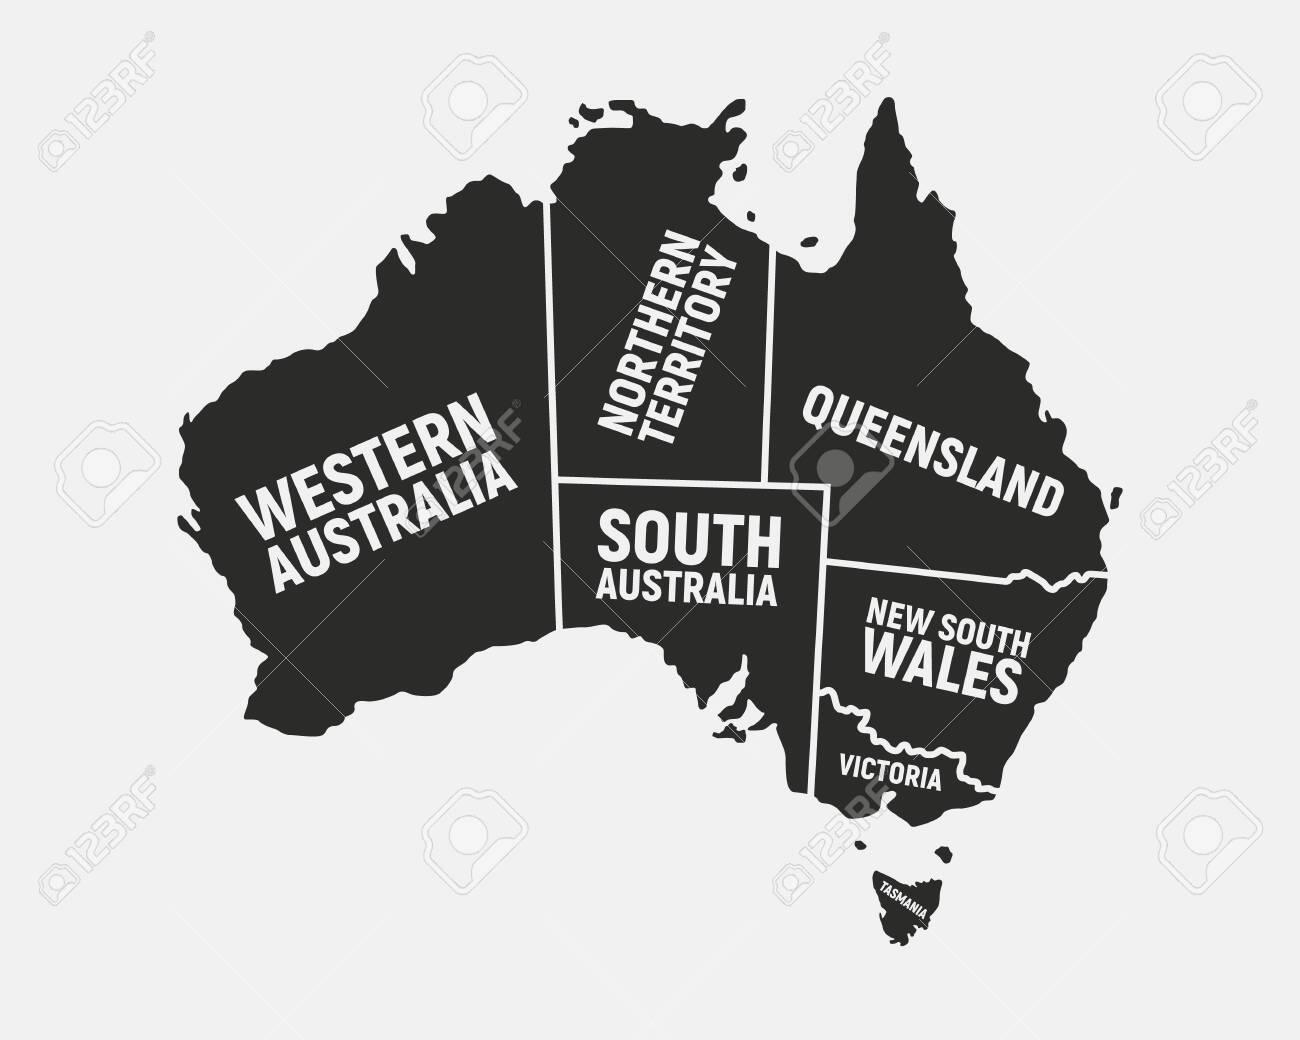 Free Map Of Australia To Print.Australia Poster Map With States Names Australian Background